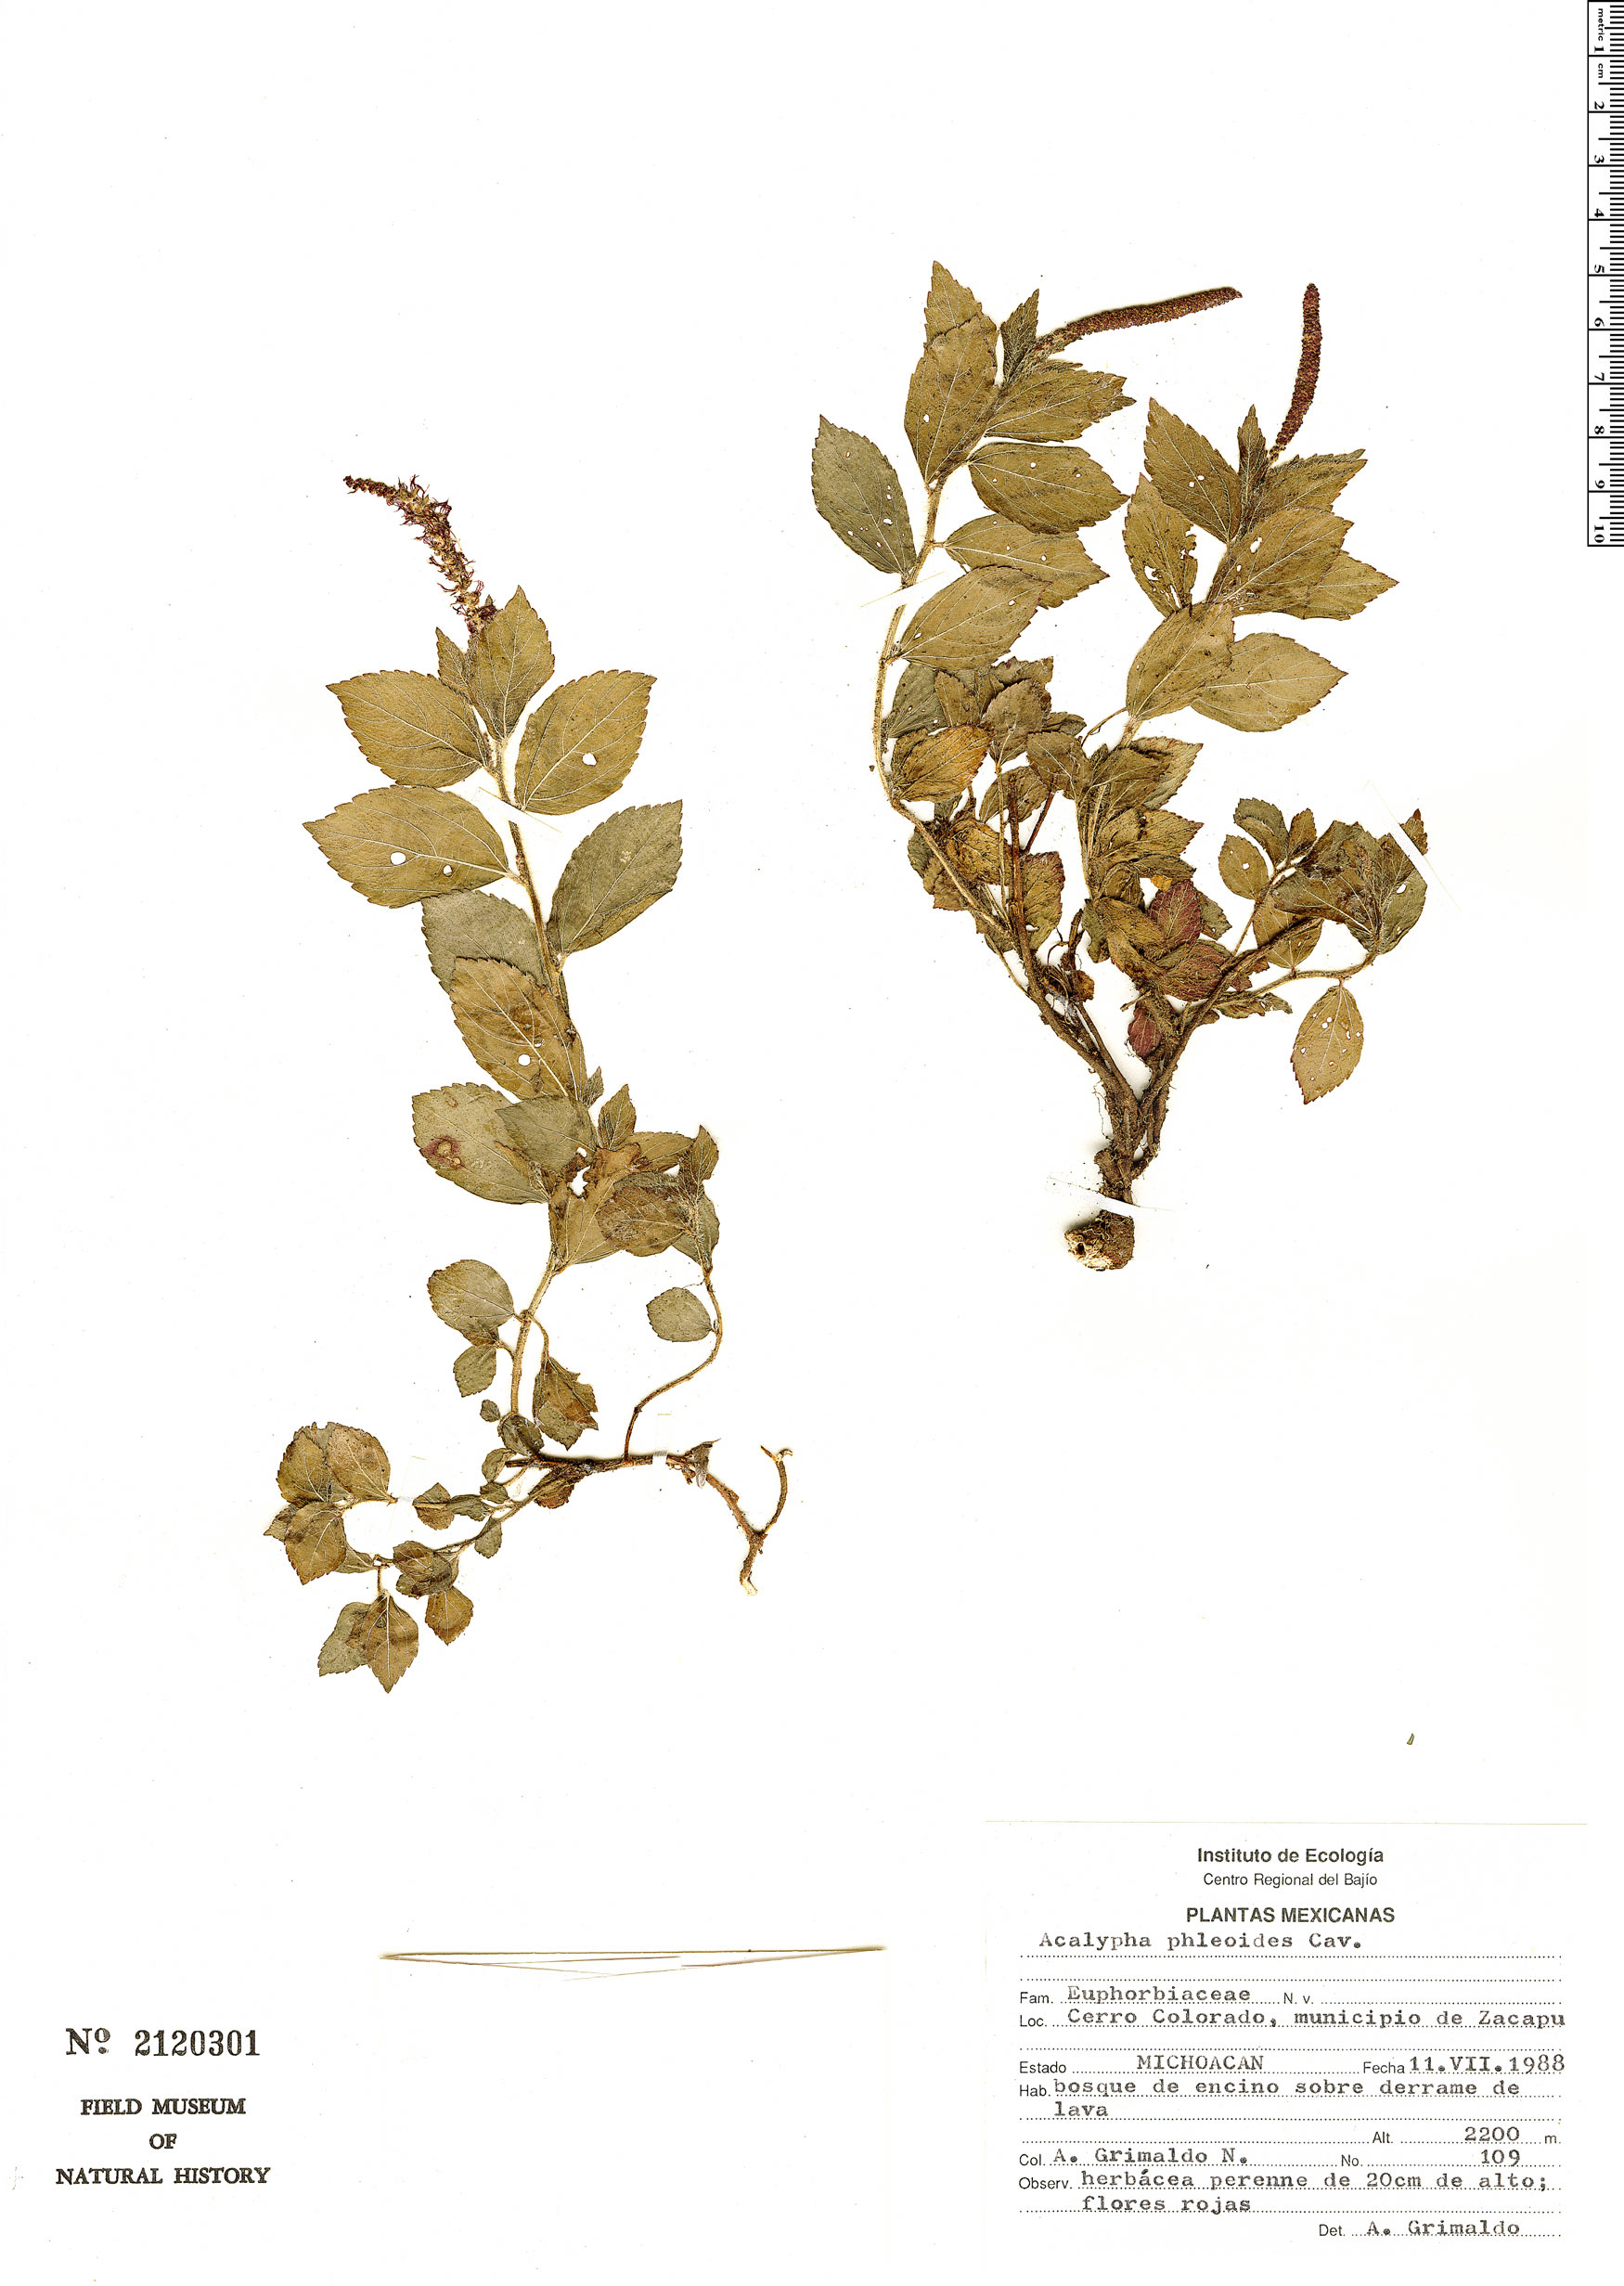 Specimen: Acalypha phleoides